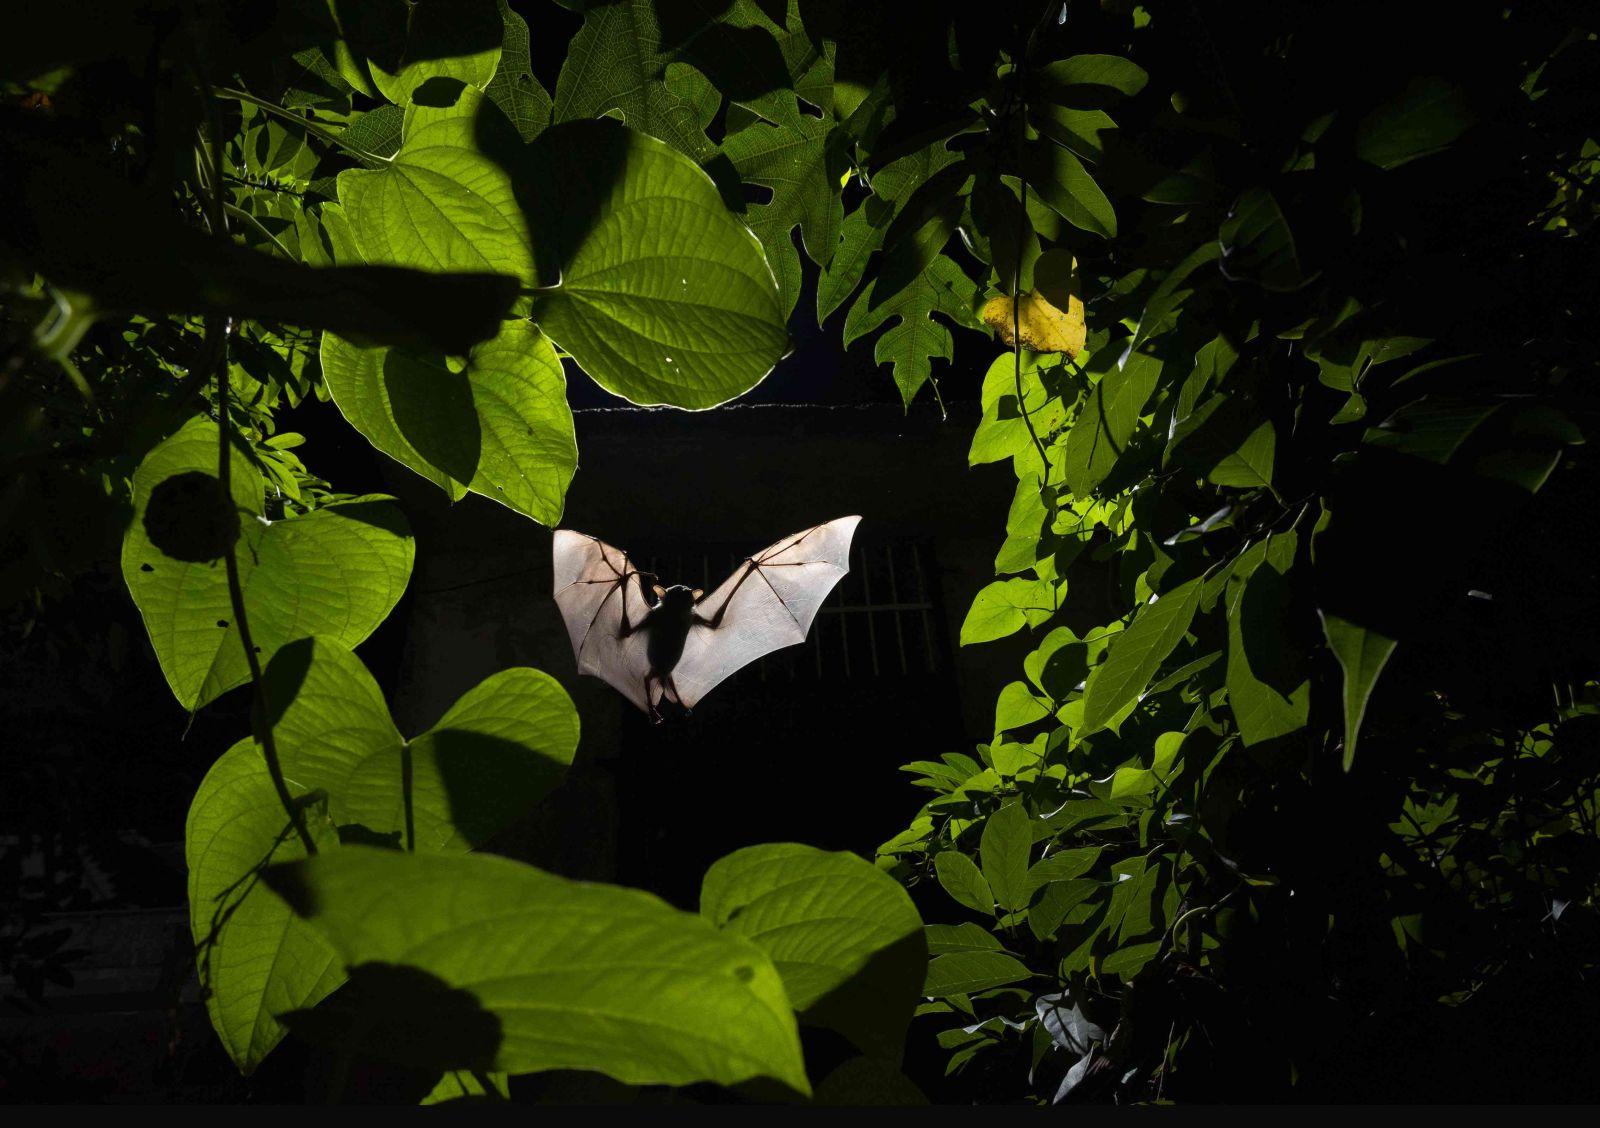 award winning a fruit bat framed by a ring of leaves